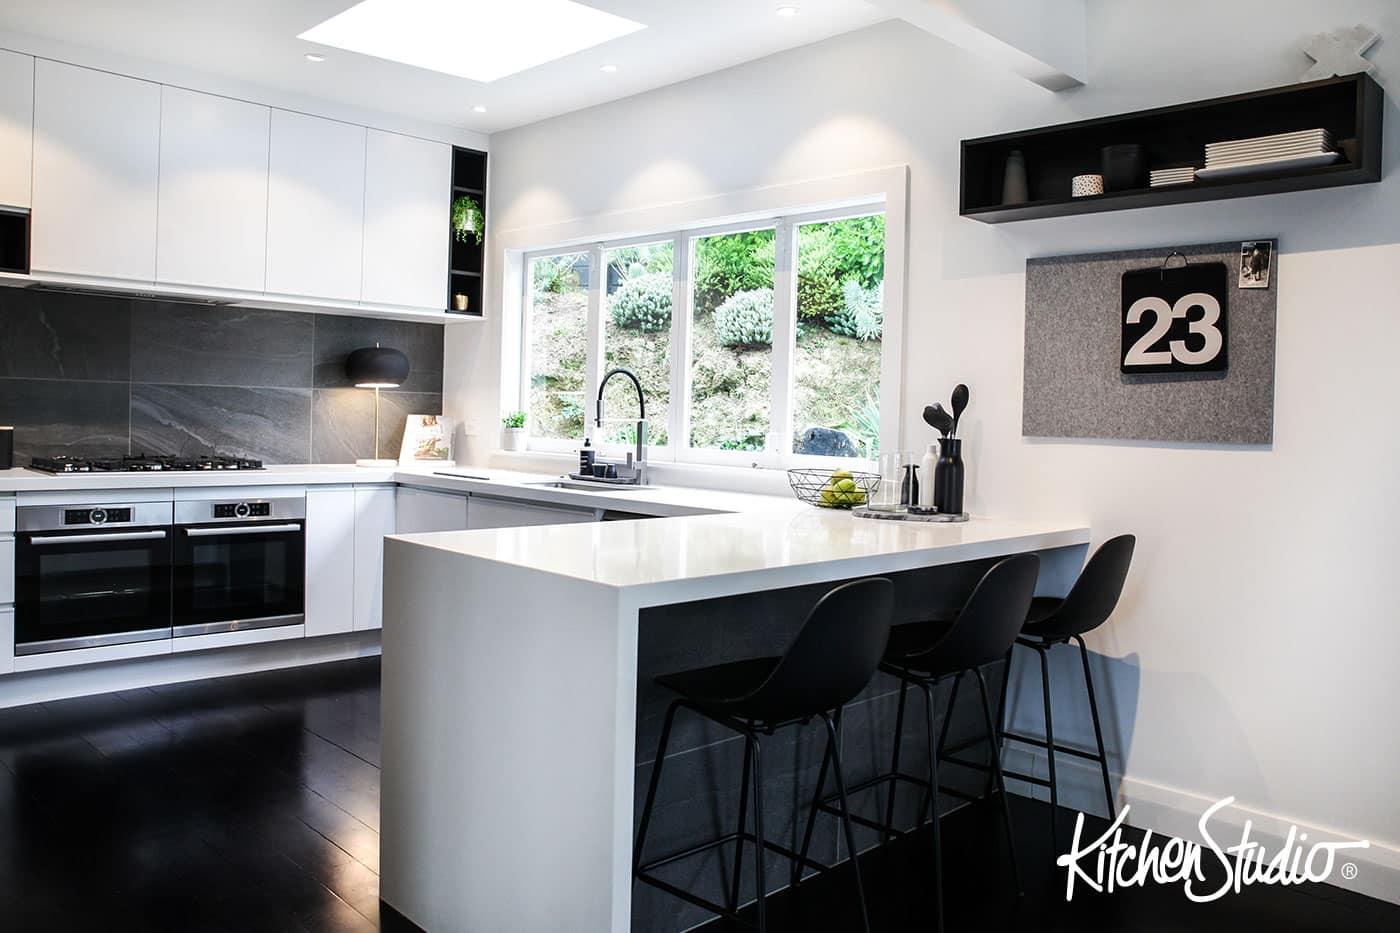 Be Bold With Black White Kitchen Studio